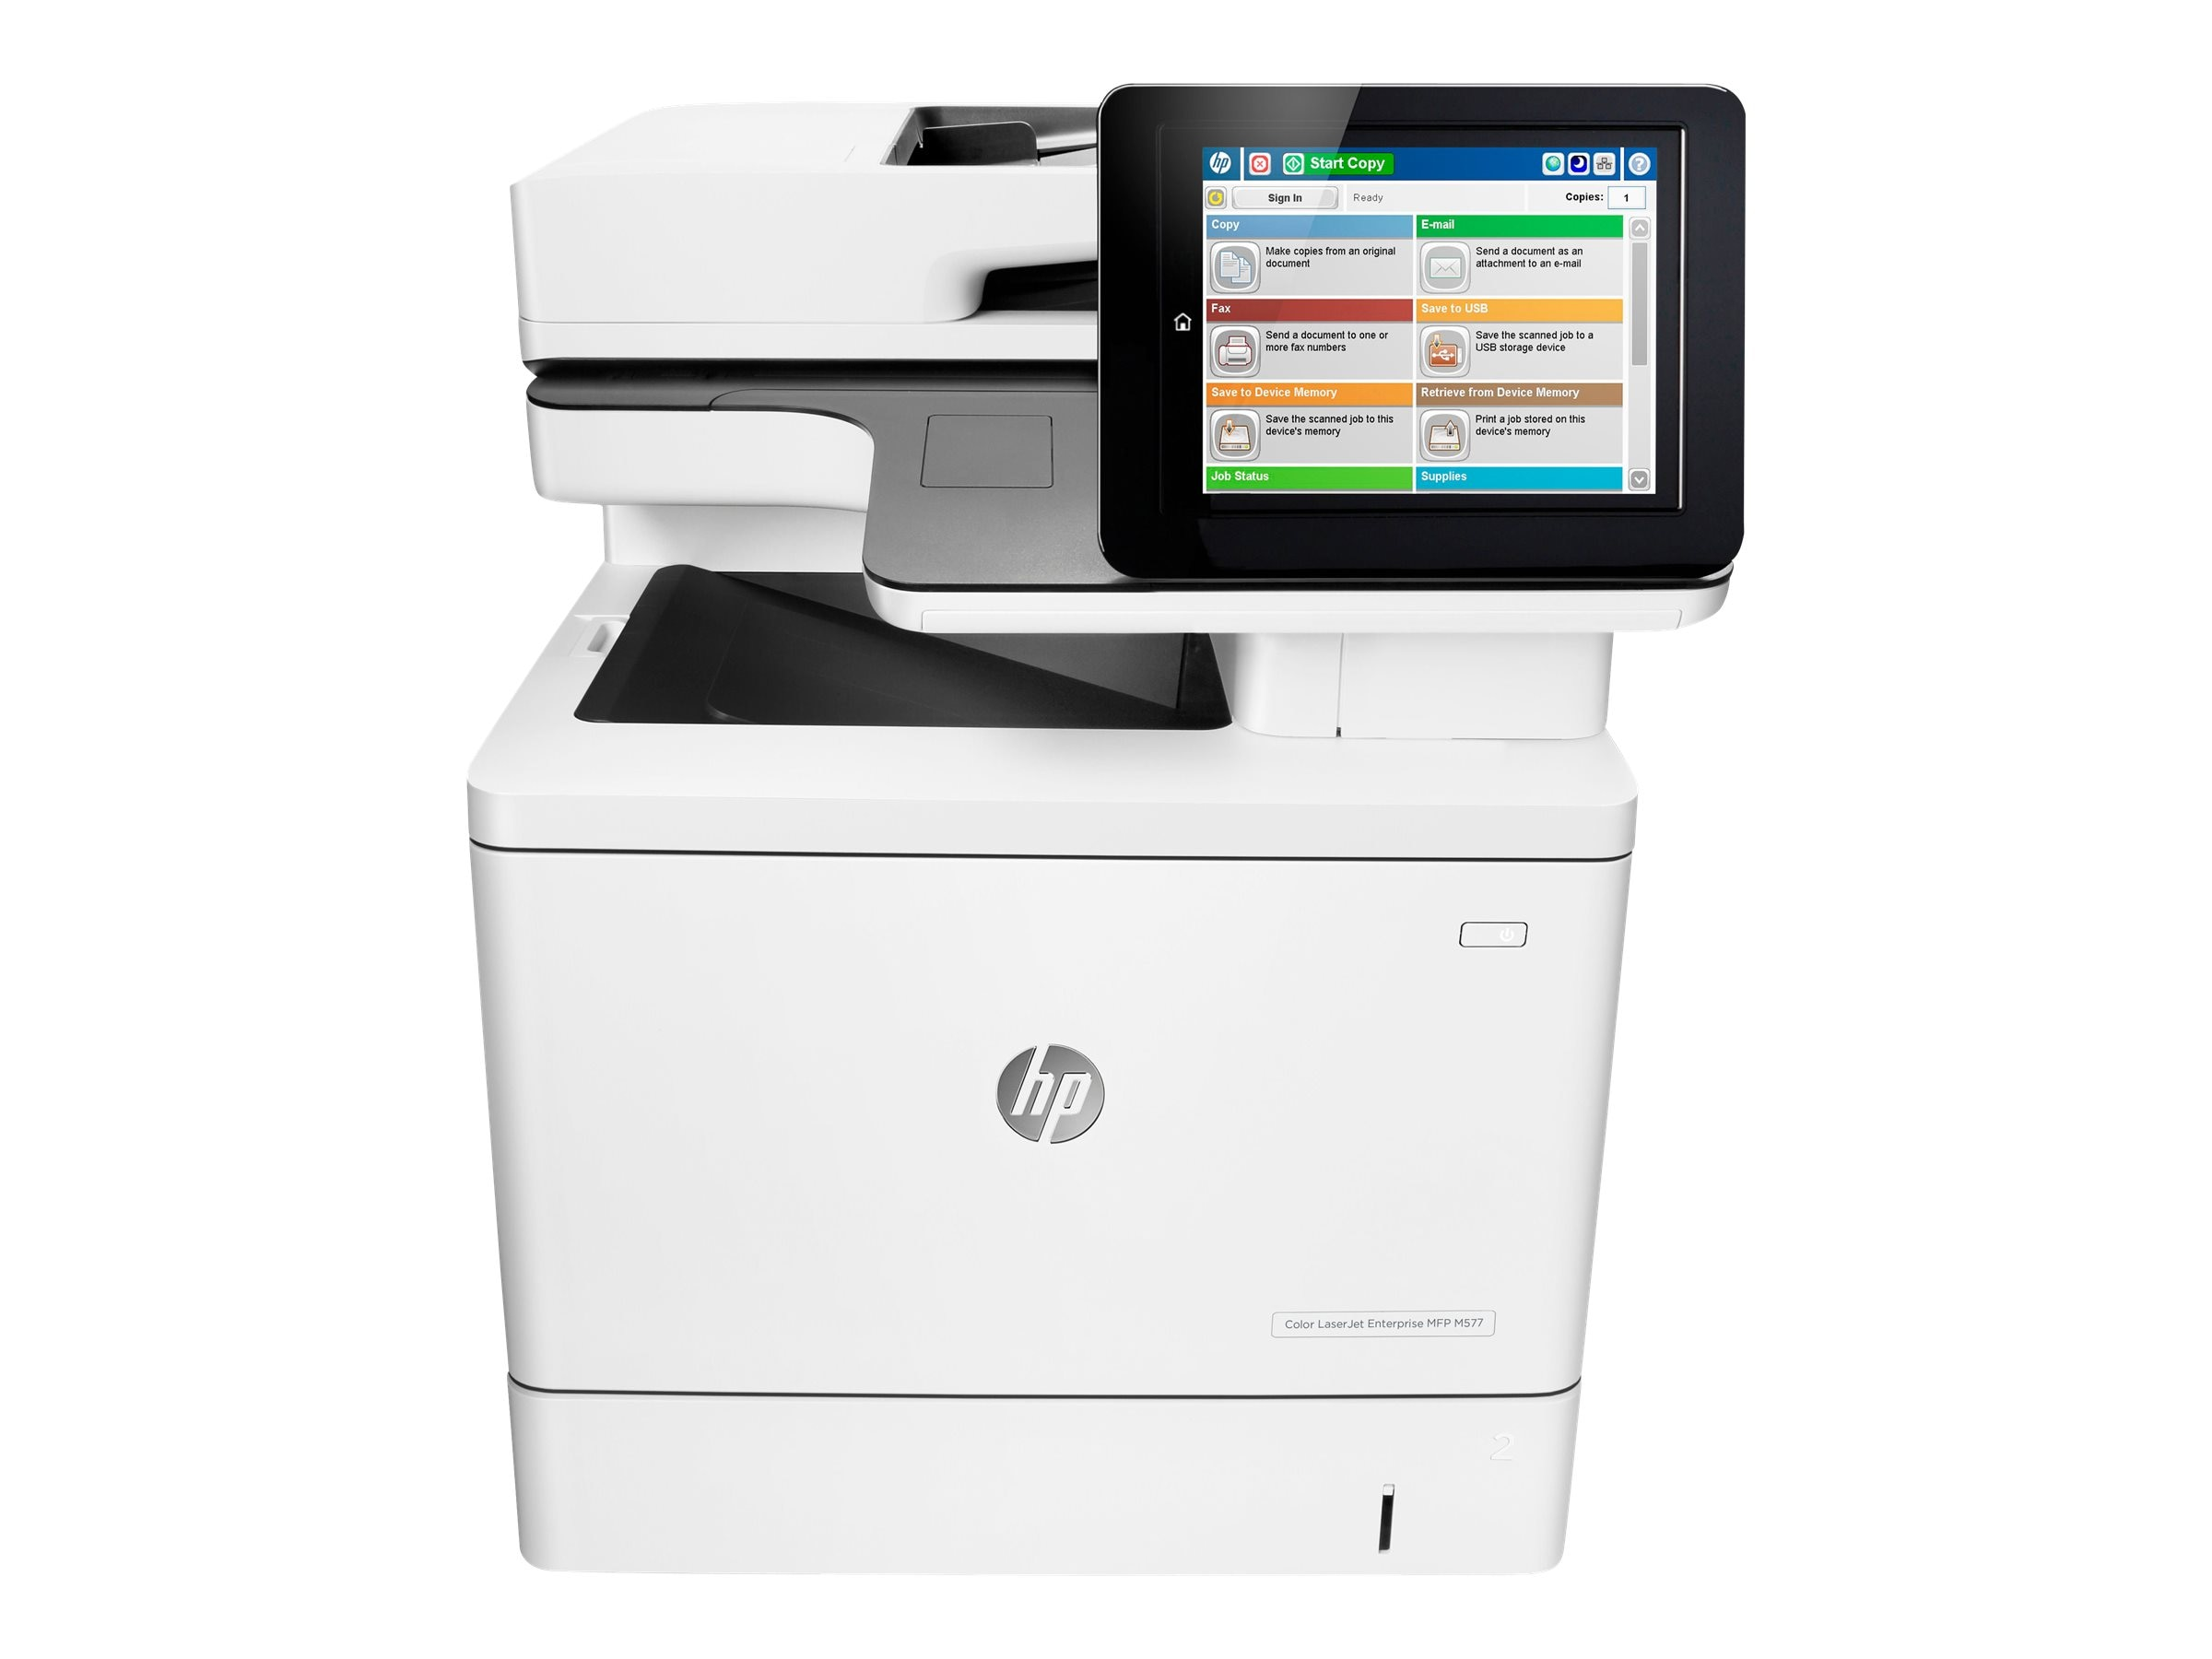 Buy HP Color LaserJet Enterprise MFP M577dn at Connection